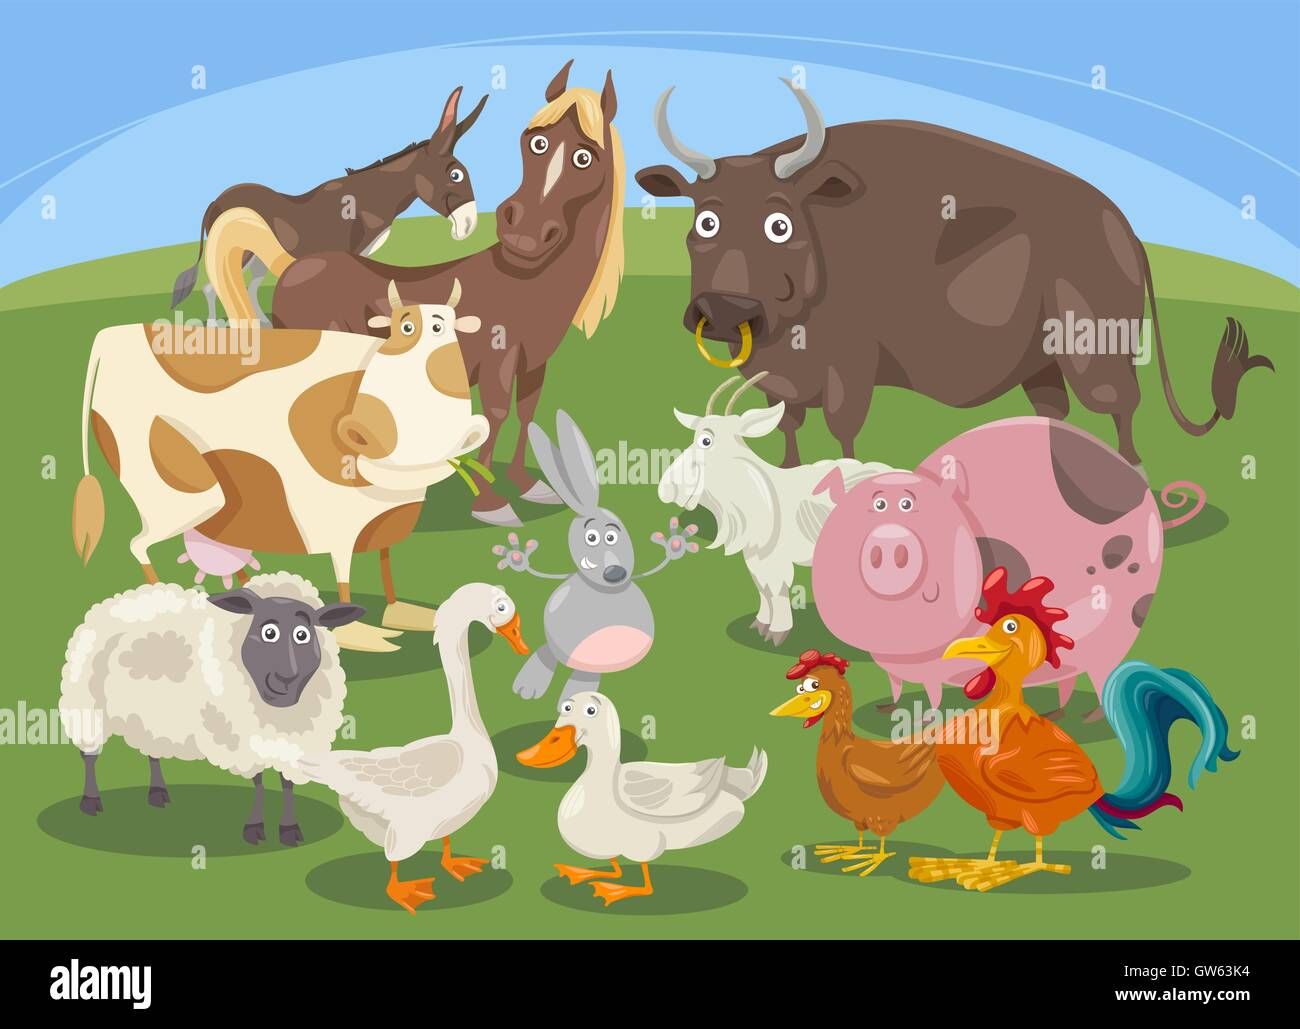 farm animals group cartoon stock vector art u0026 illustration vector